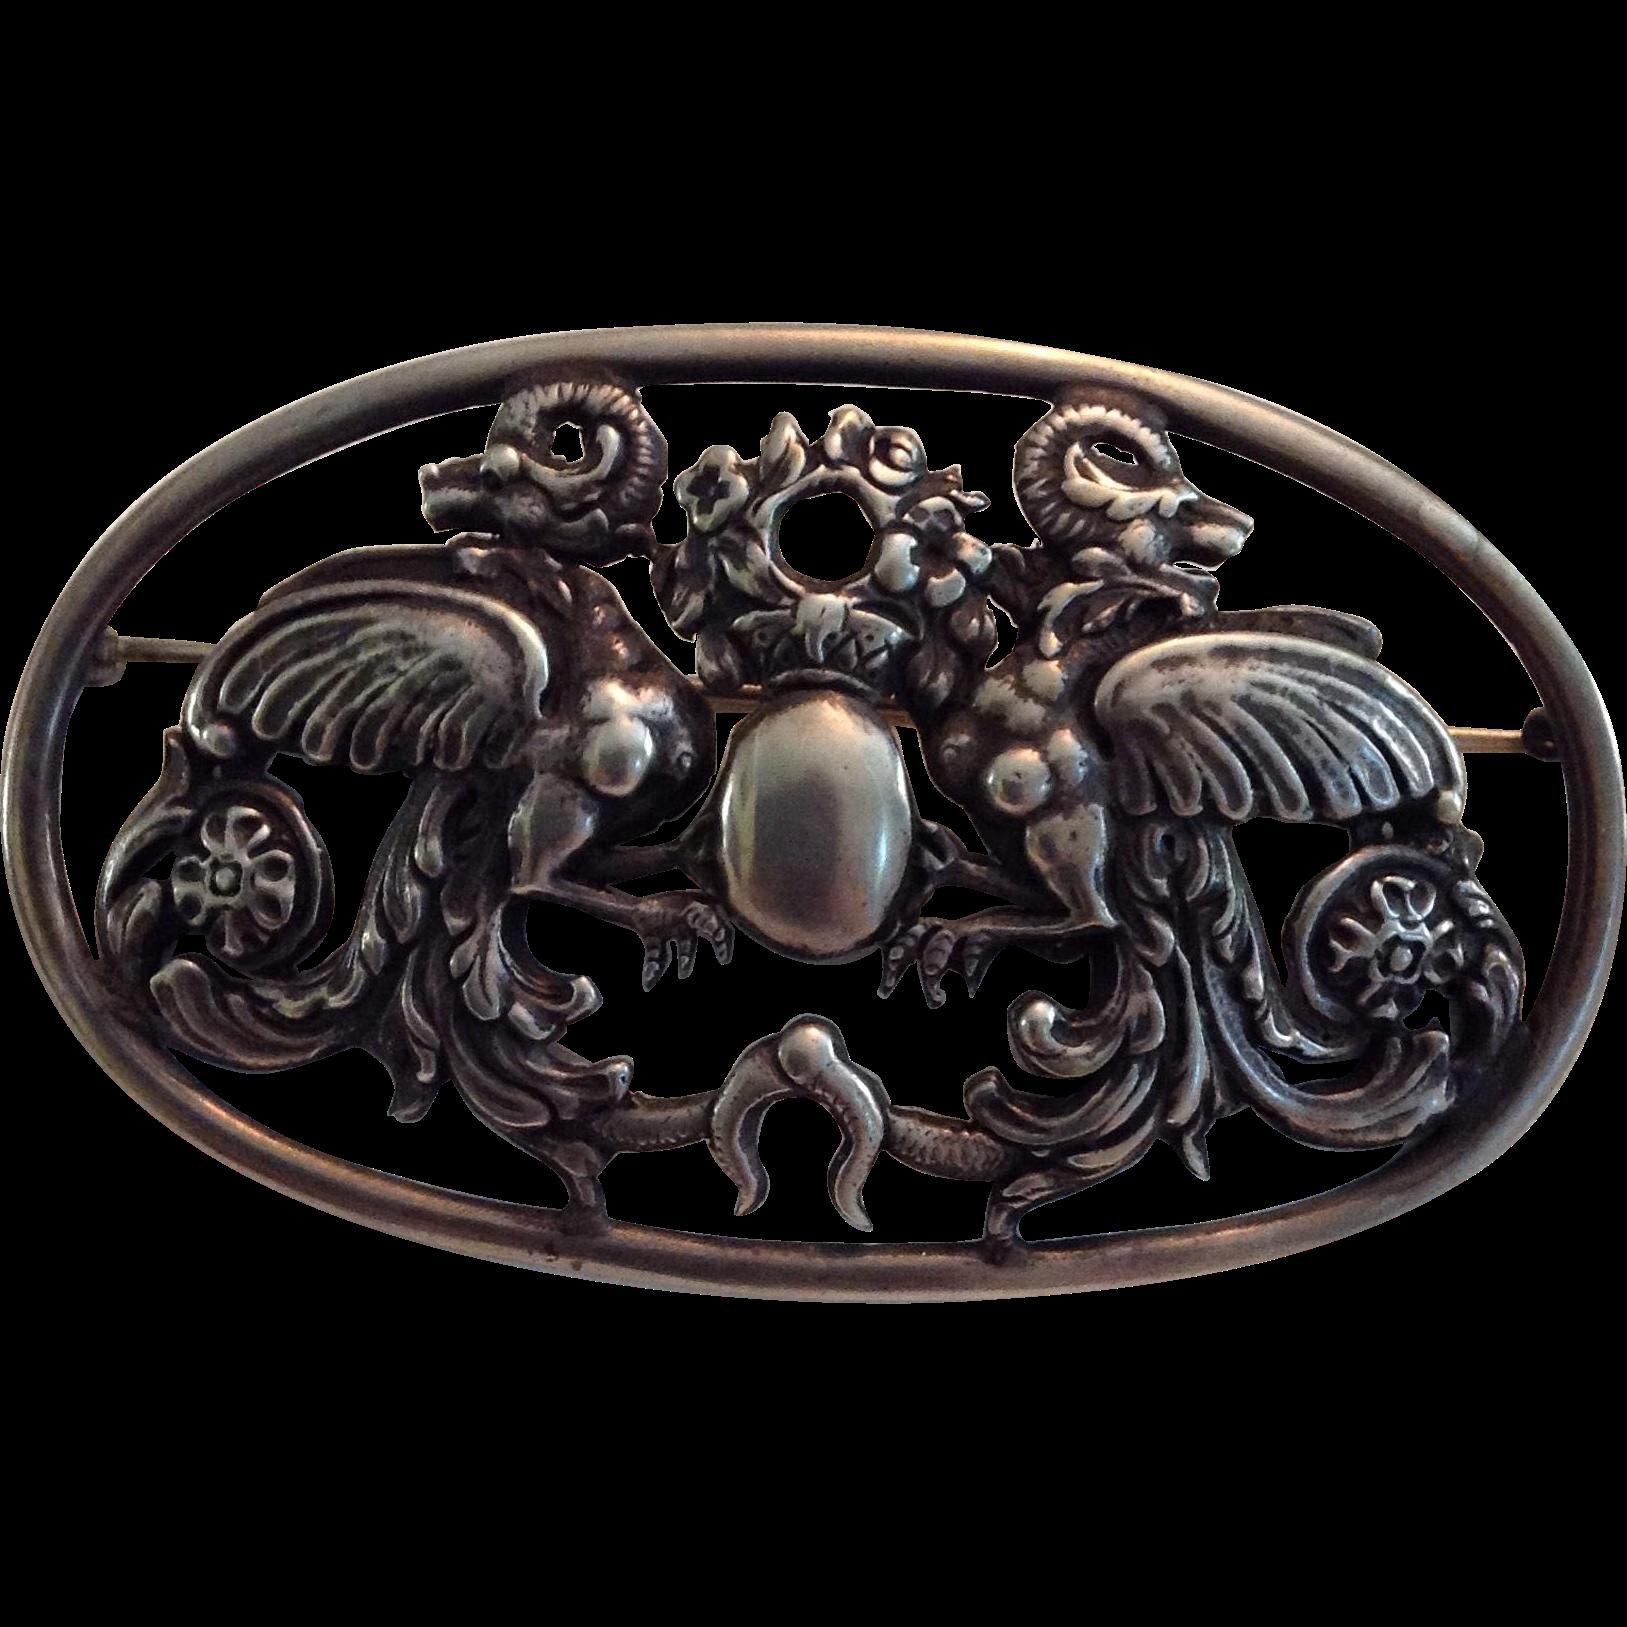 20th Century Large Peruzzi Silver Pin Brooch